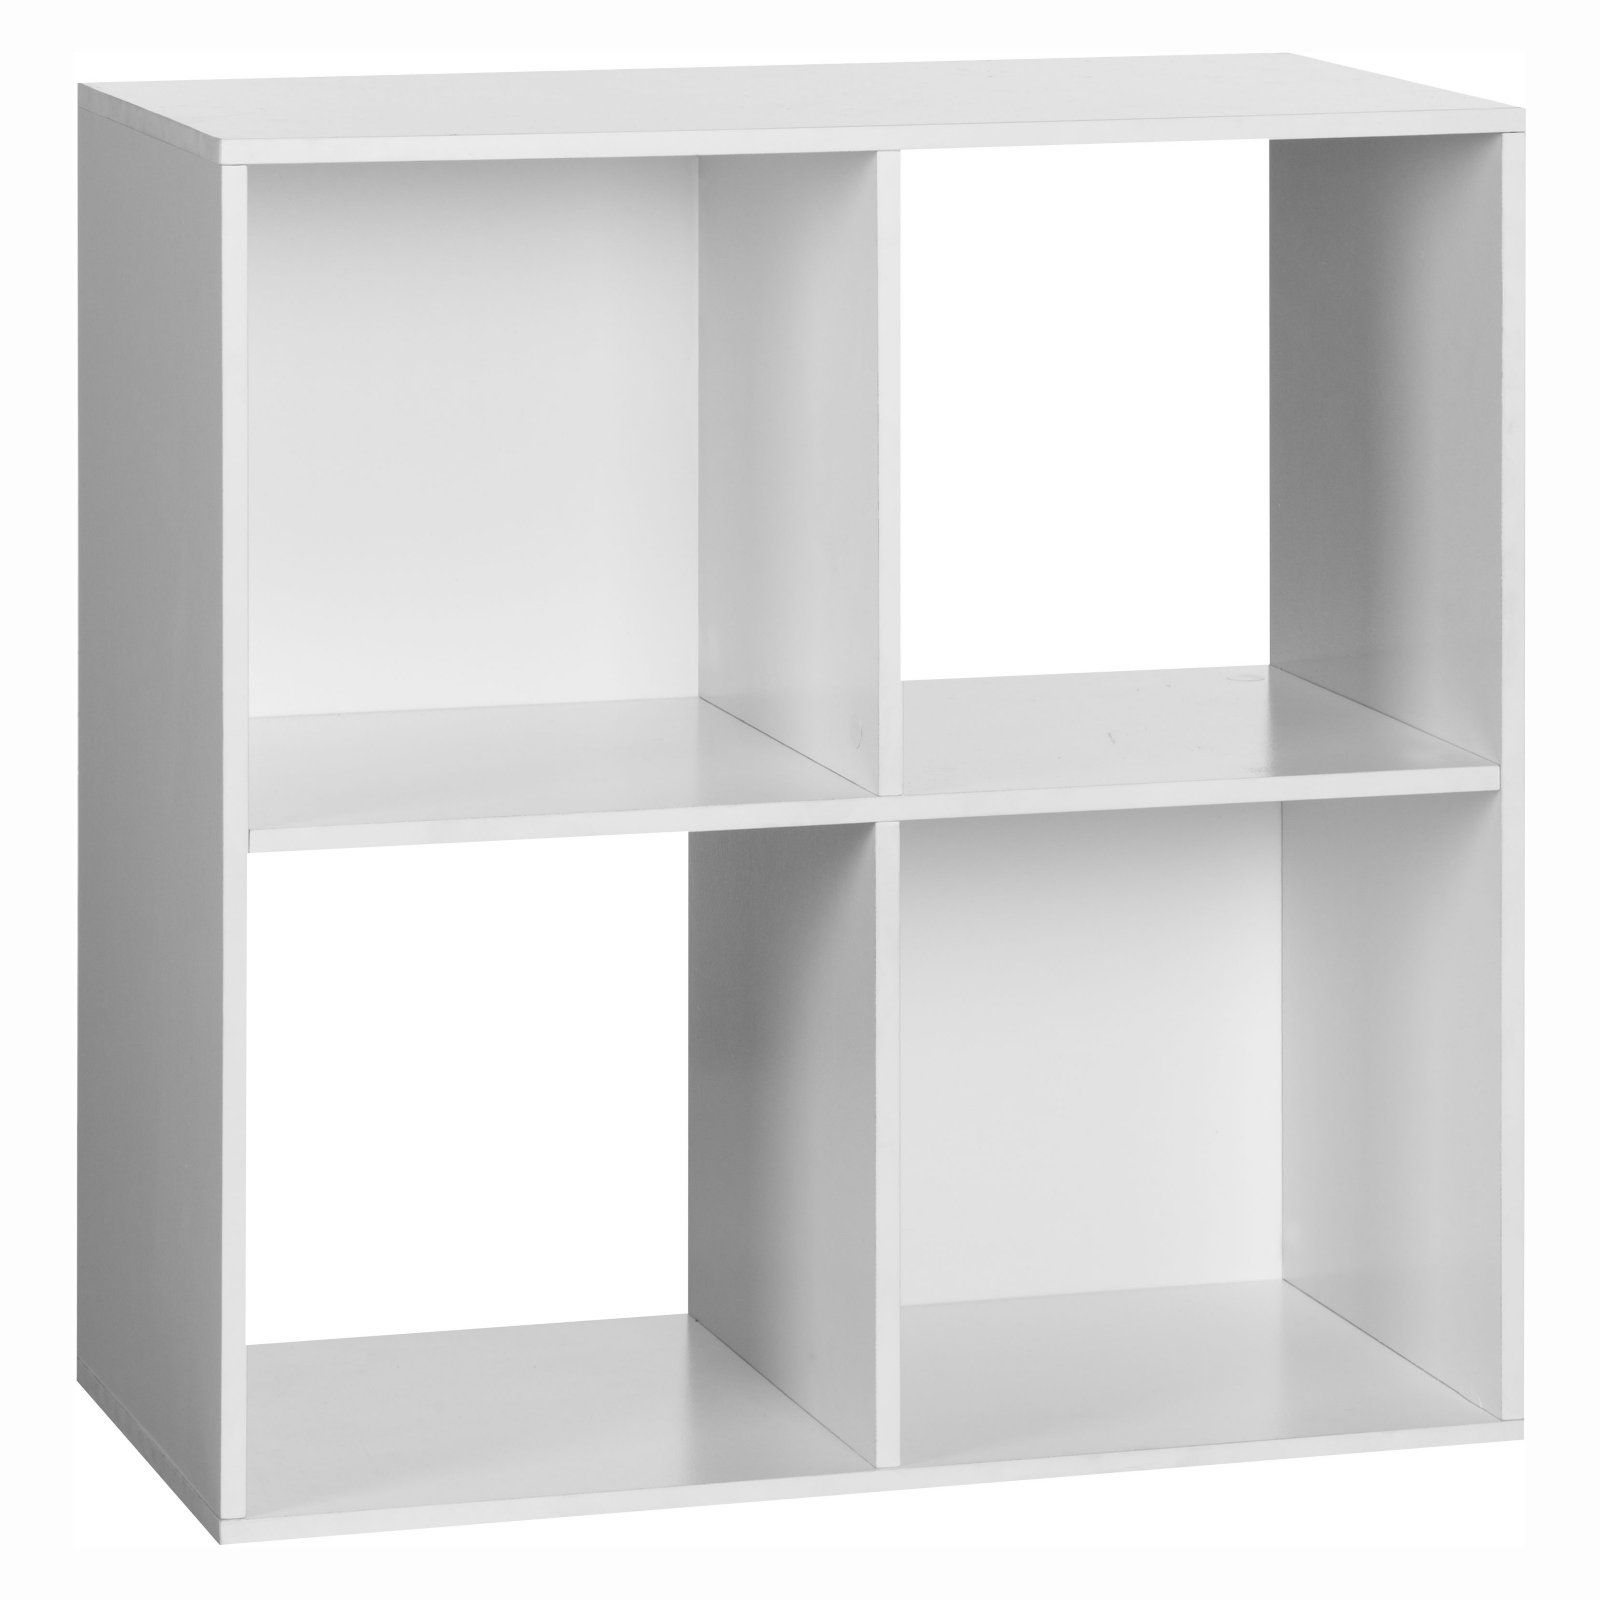 Onespace 4 Cube Organizer Bookcase Cube Organizer Cube Storage Bookcase Organization